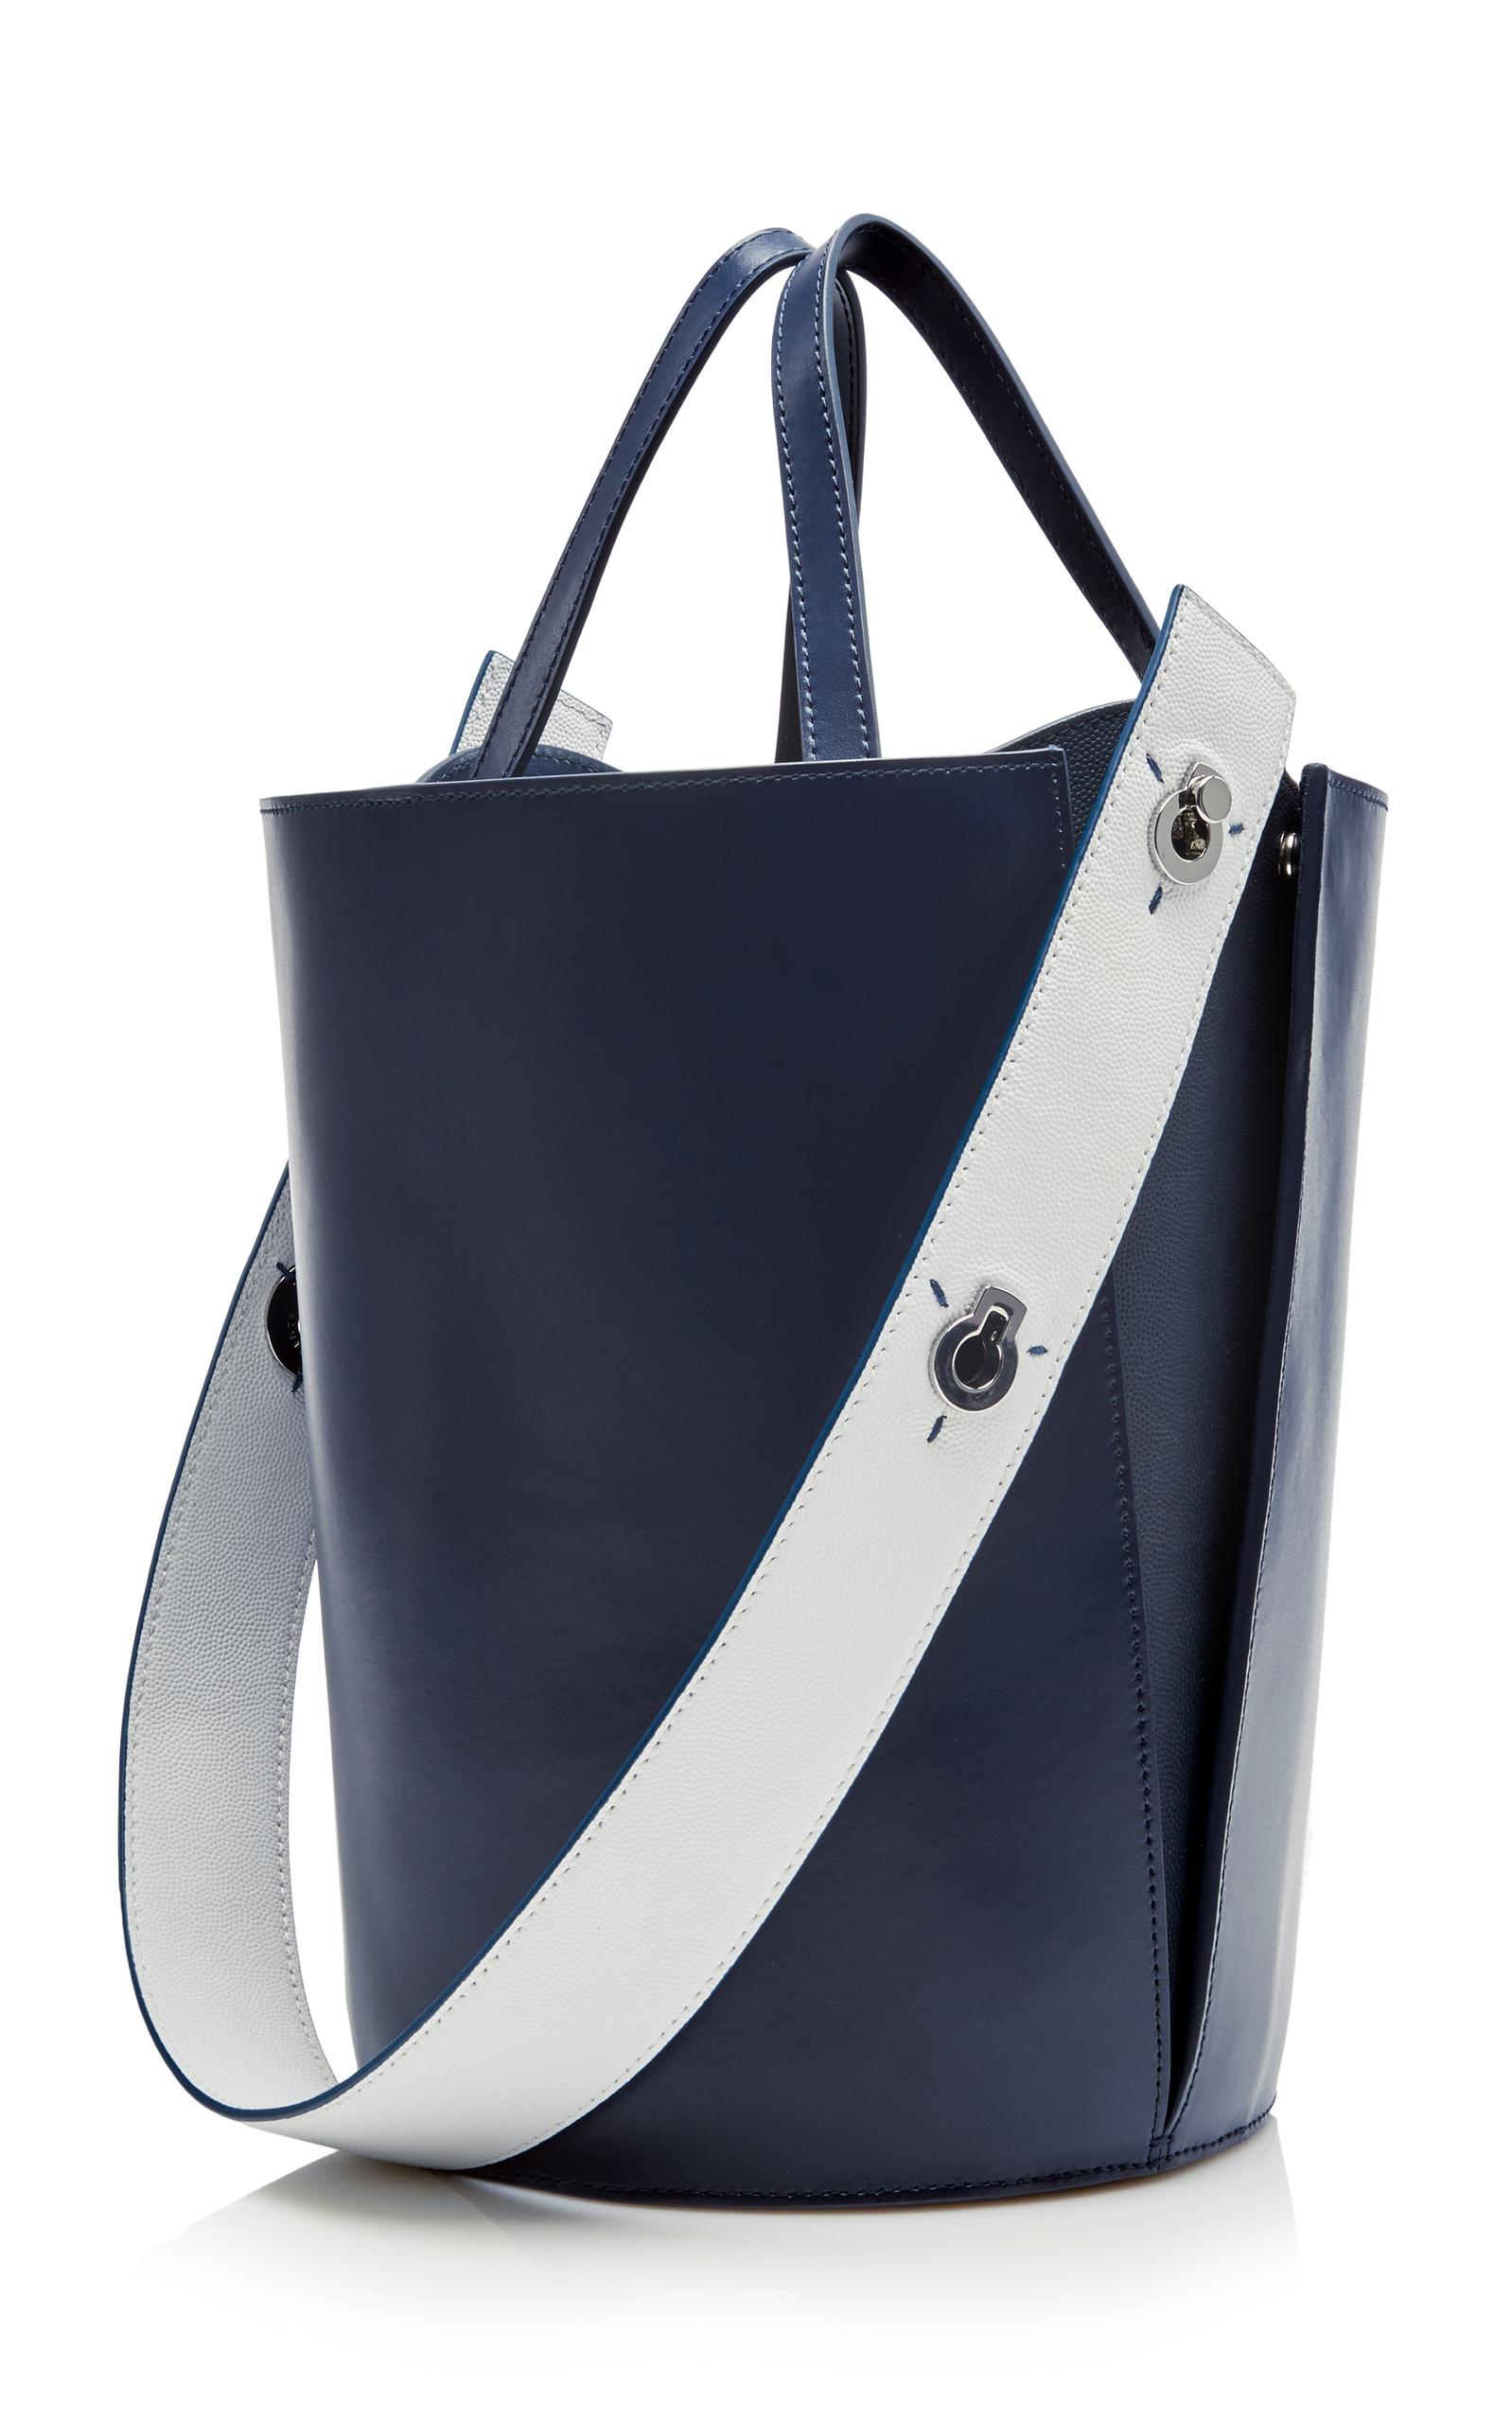 ef7c28a306d6d Danse LenteMini Lorna Bucket Bag. CLOSE. Loading. Loading. Loading